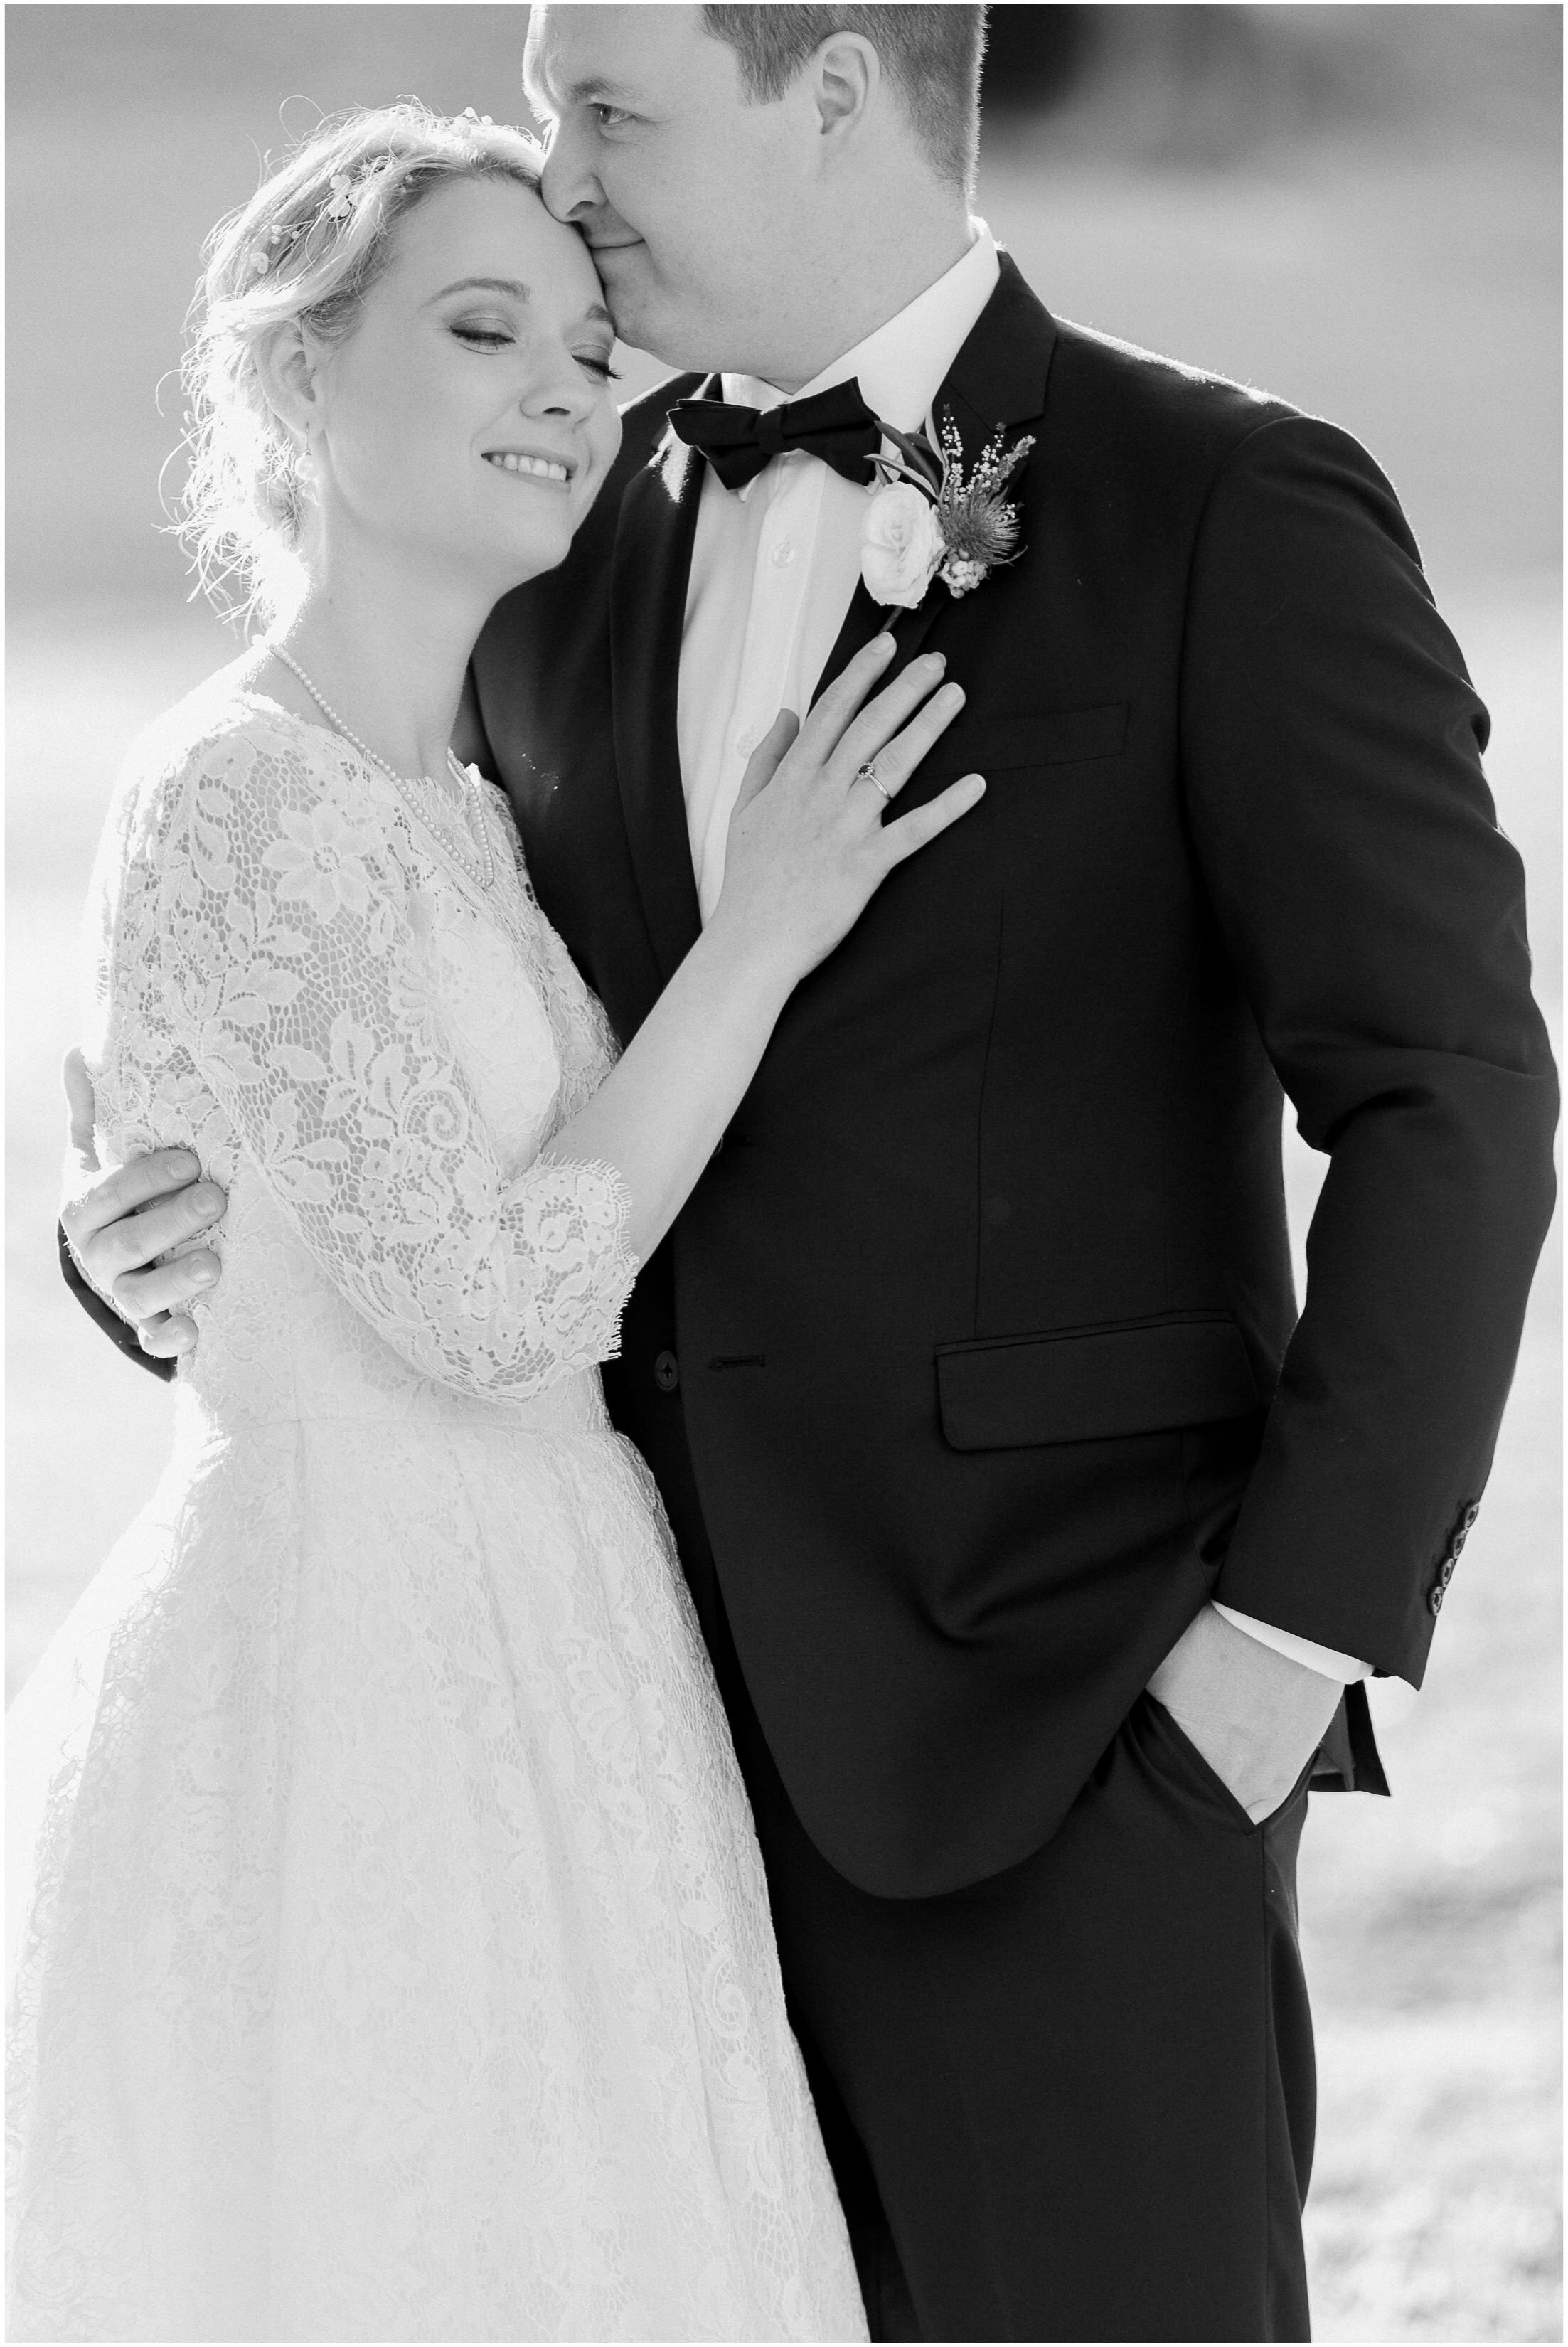 brisbane-fine-art-wedding-photographer-lauren-olivia-luxury-wedding-australia-22.jpg